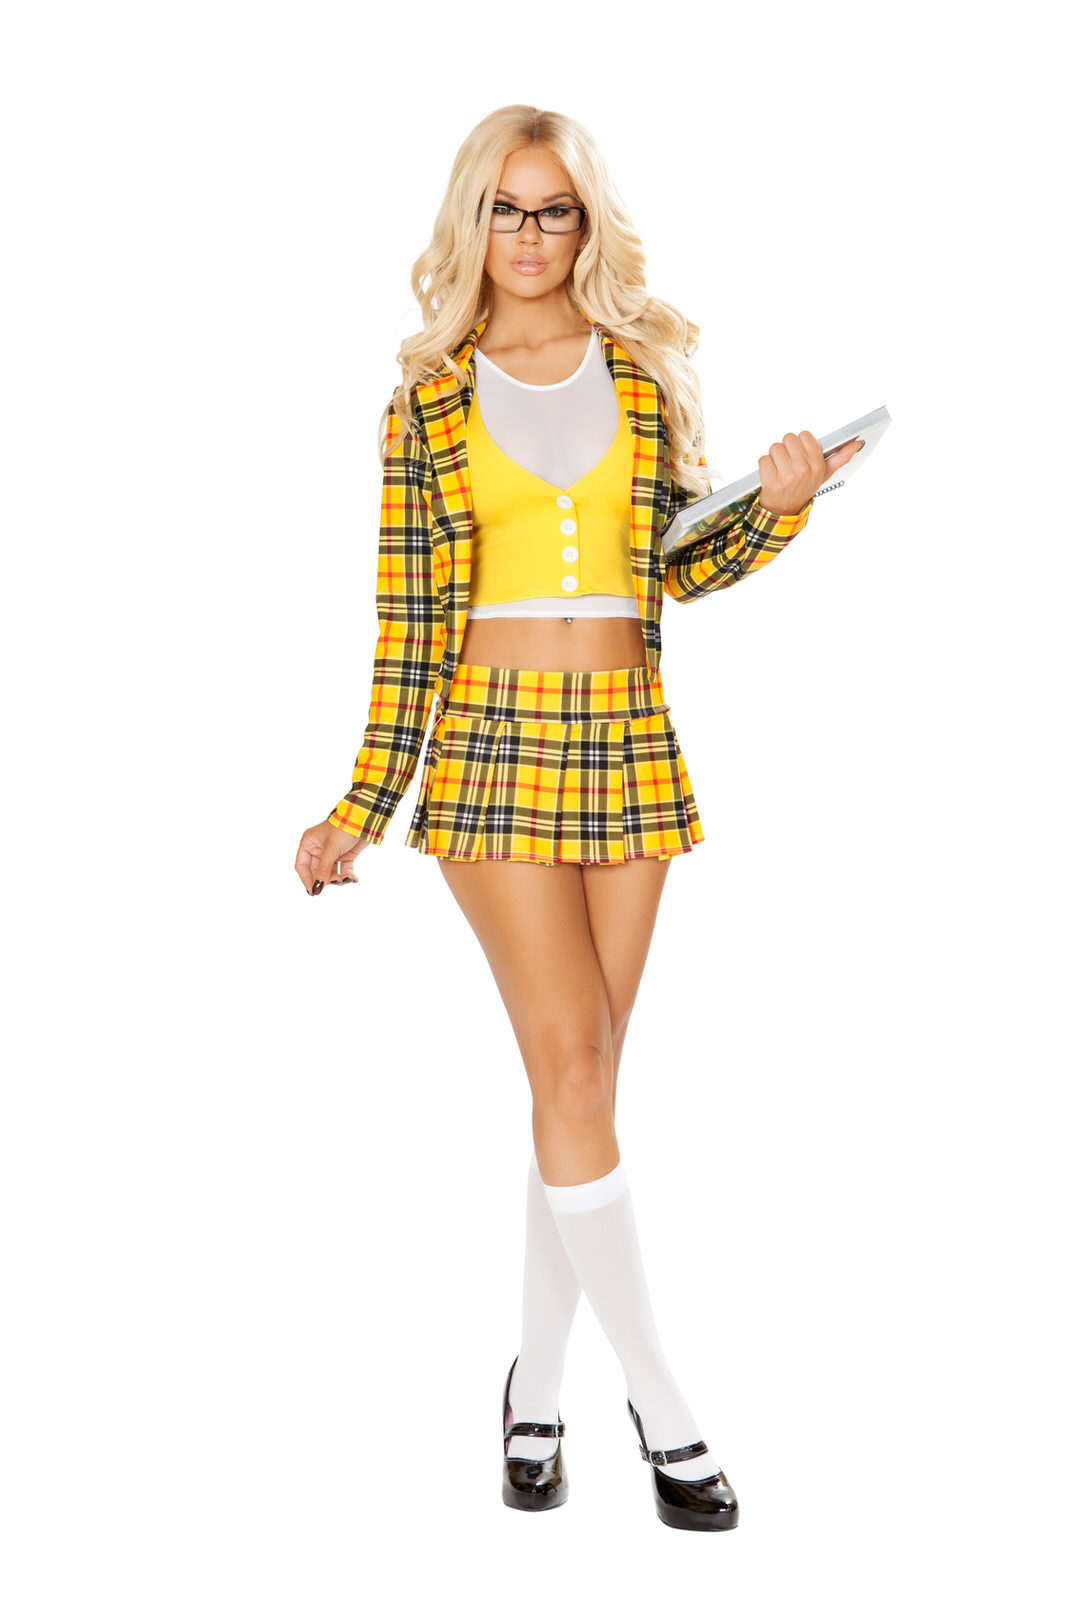 Clueless School Girl